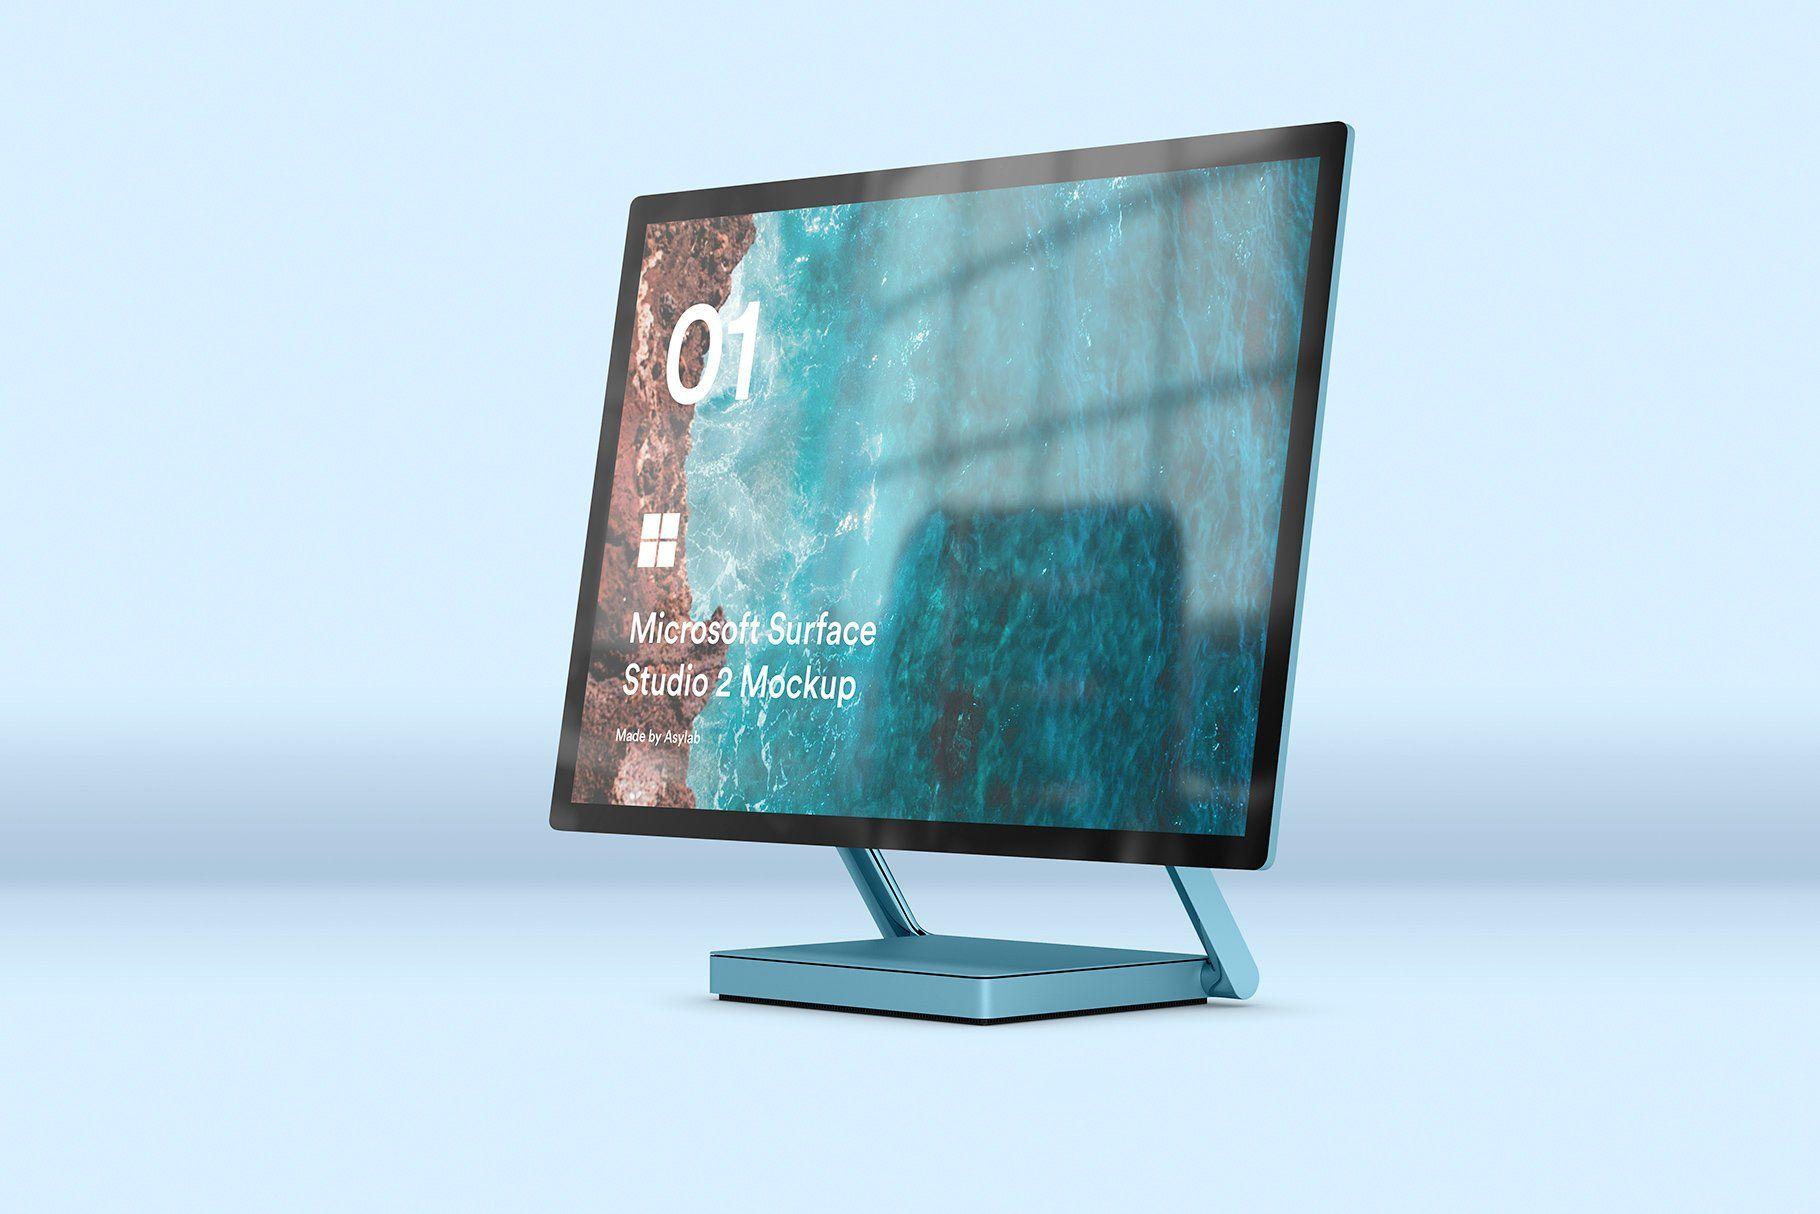 Desktop Surface Studio 2 Mockups Surface Studio Mouse Color Microsoft Surface